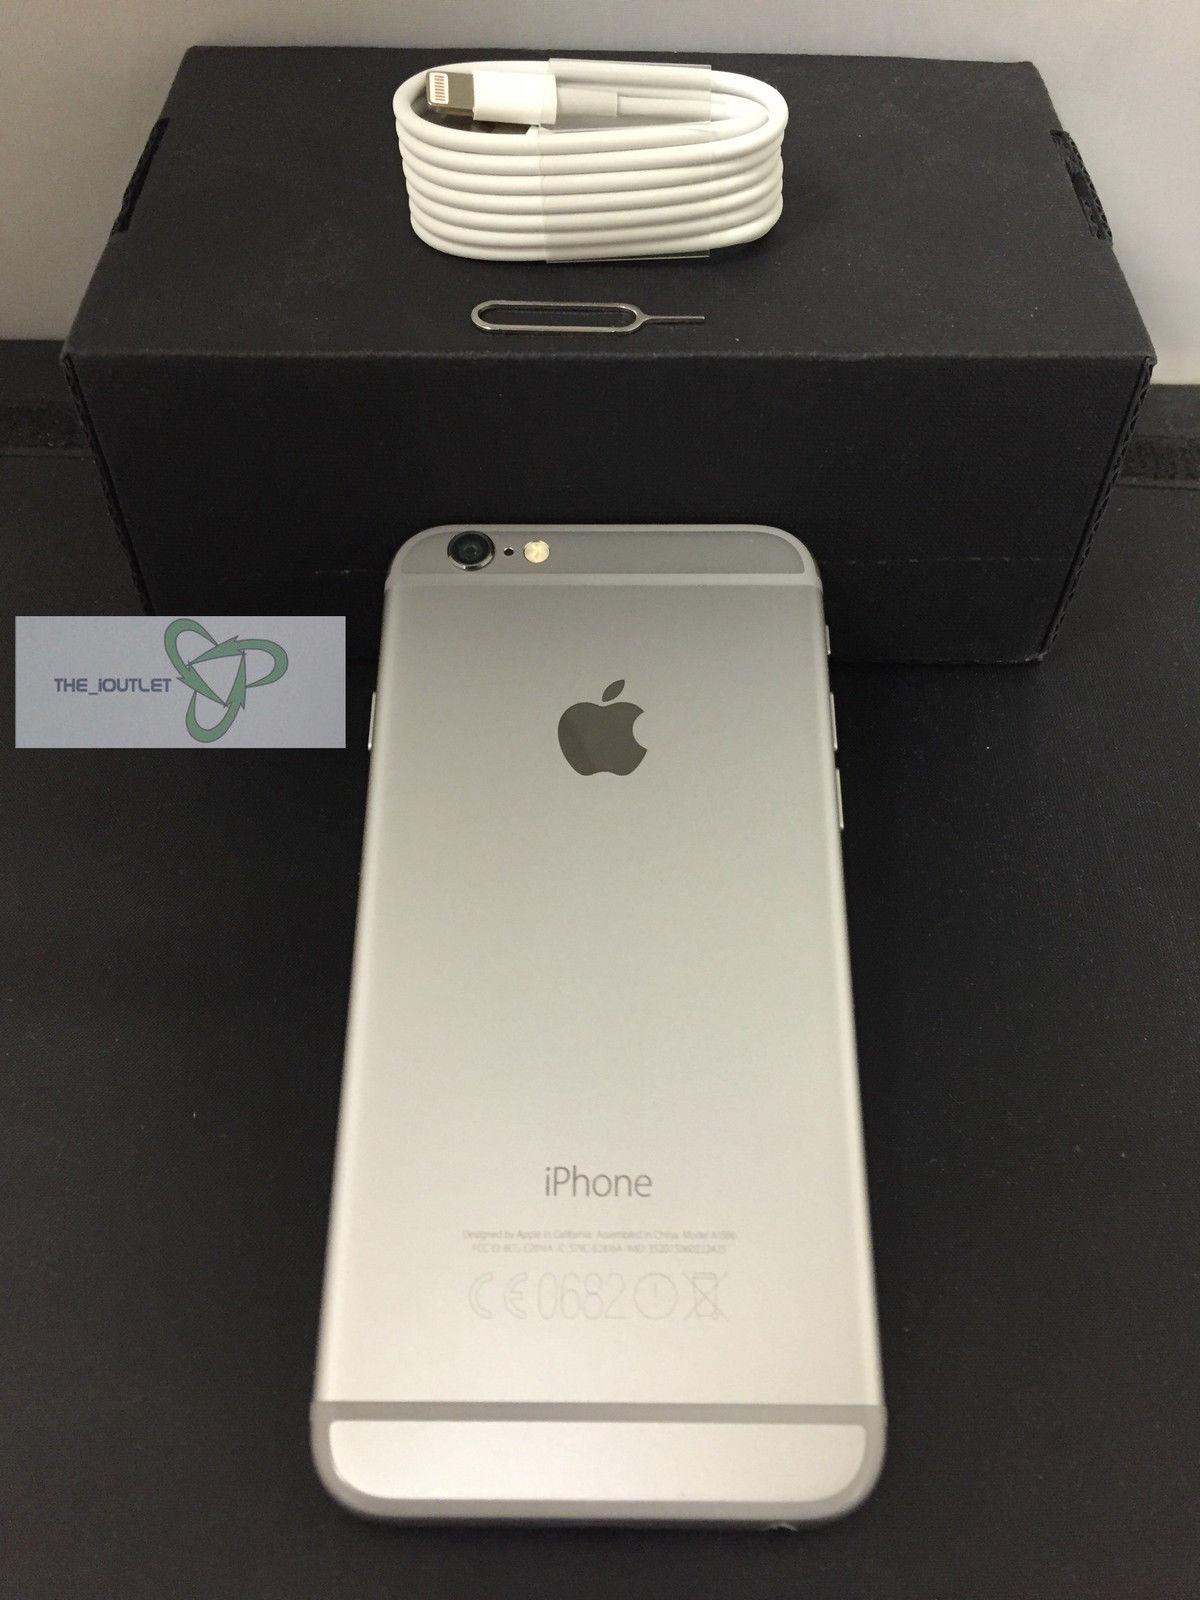 Apple iPhone 6 - 16 GB - Silver- Unlocked-Good Condition